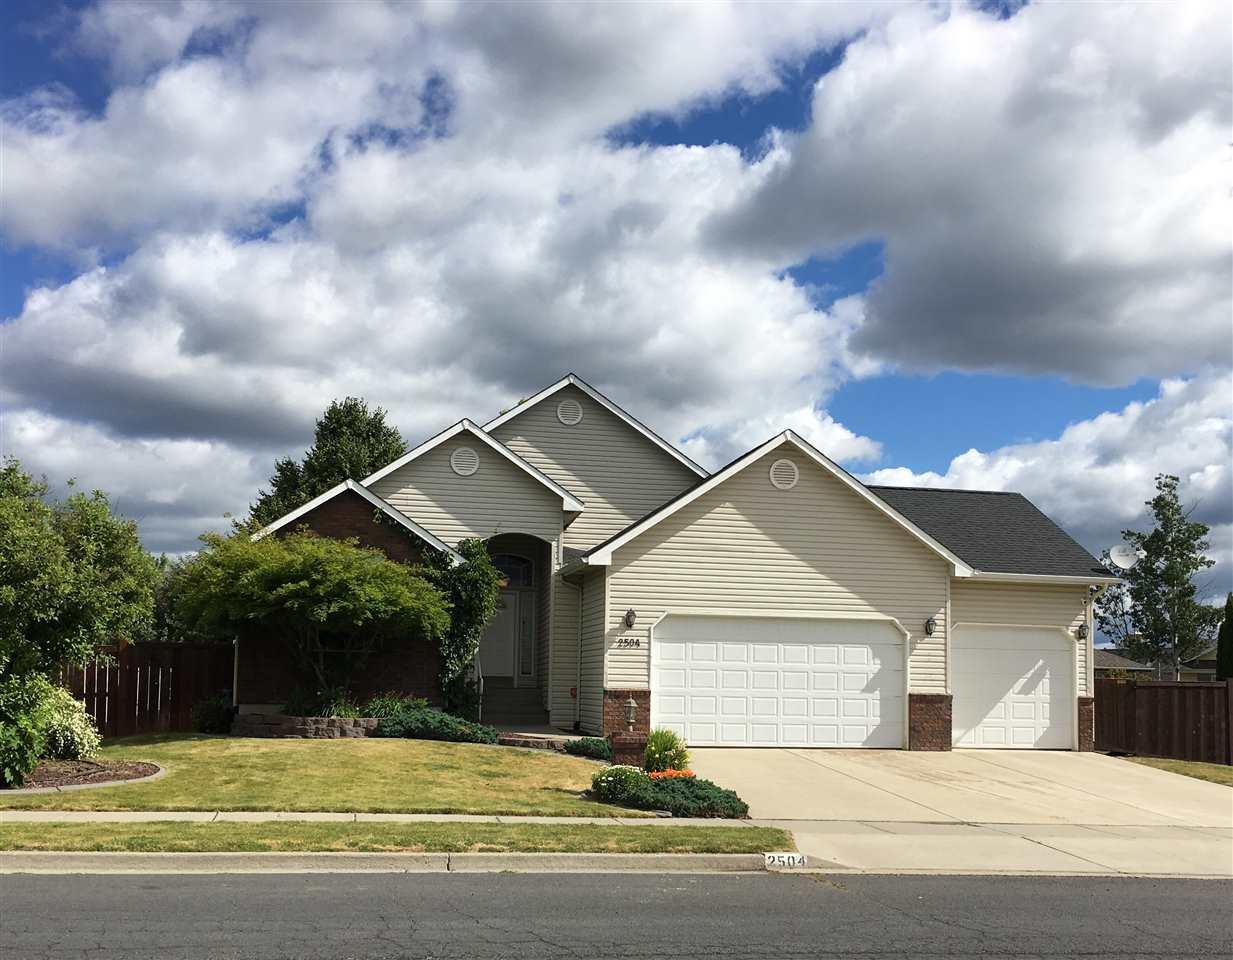 2504 W Cascade Way, Spokane, WA 99208 (#201918523) :: Northwest Professional Real Estate